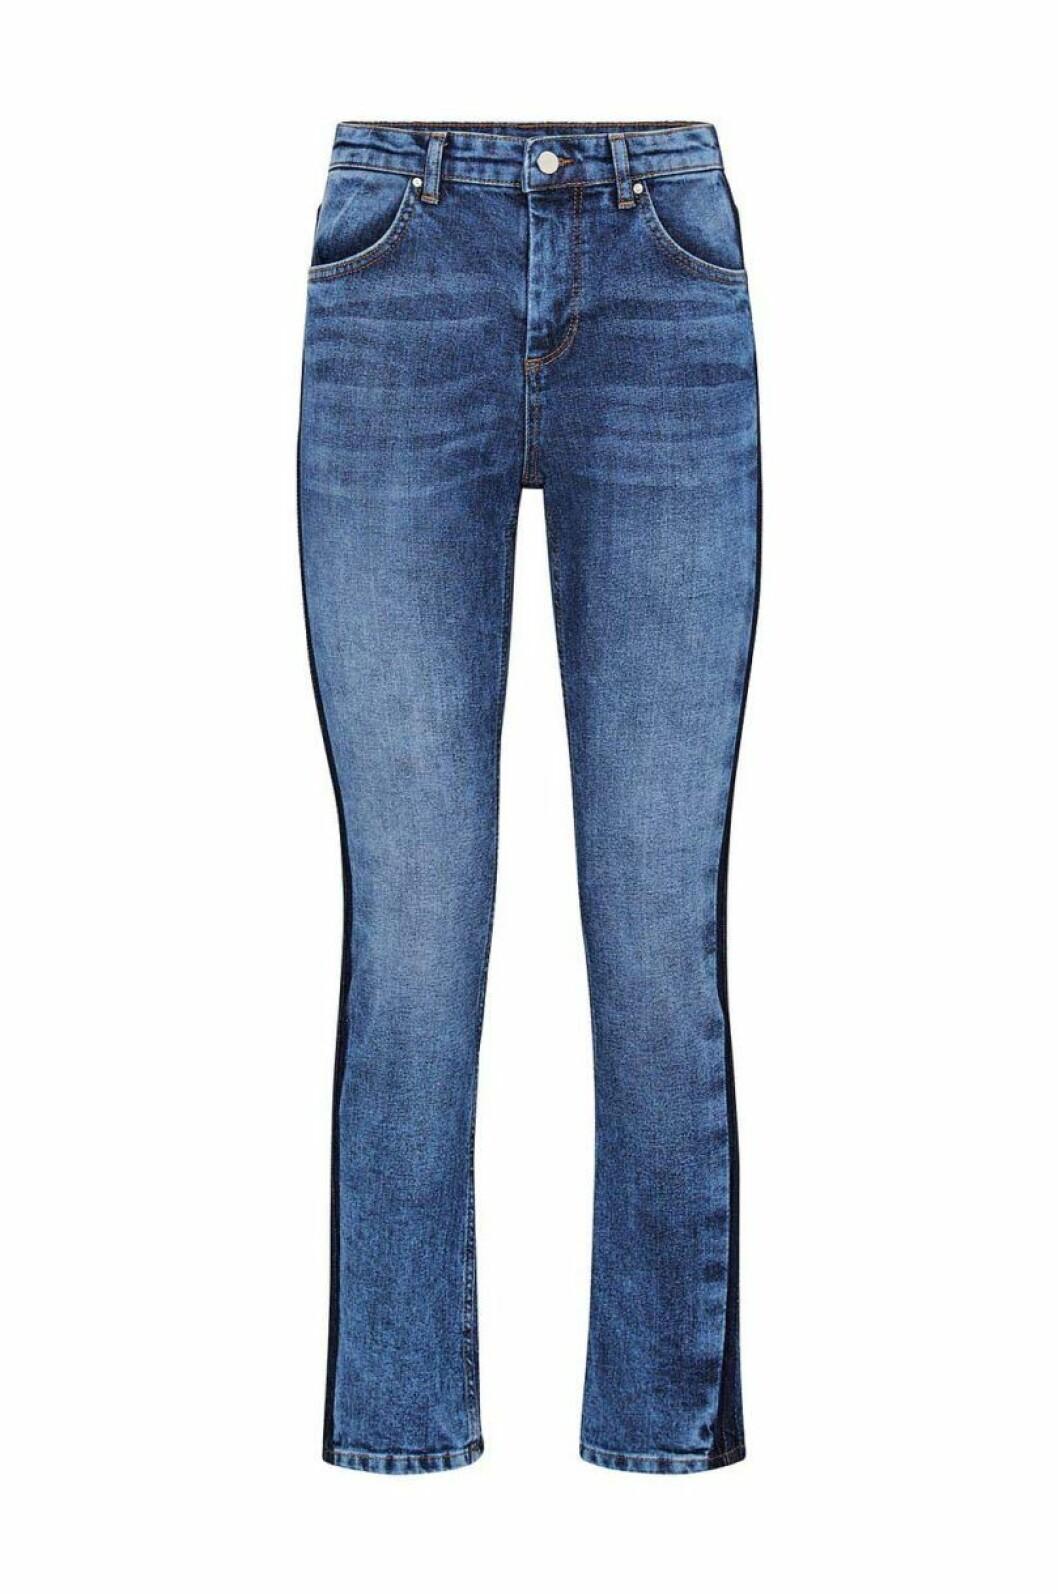 denim-jeans-ellos